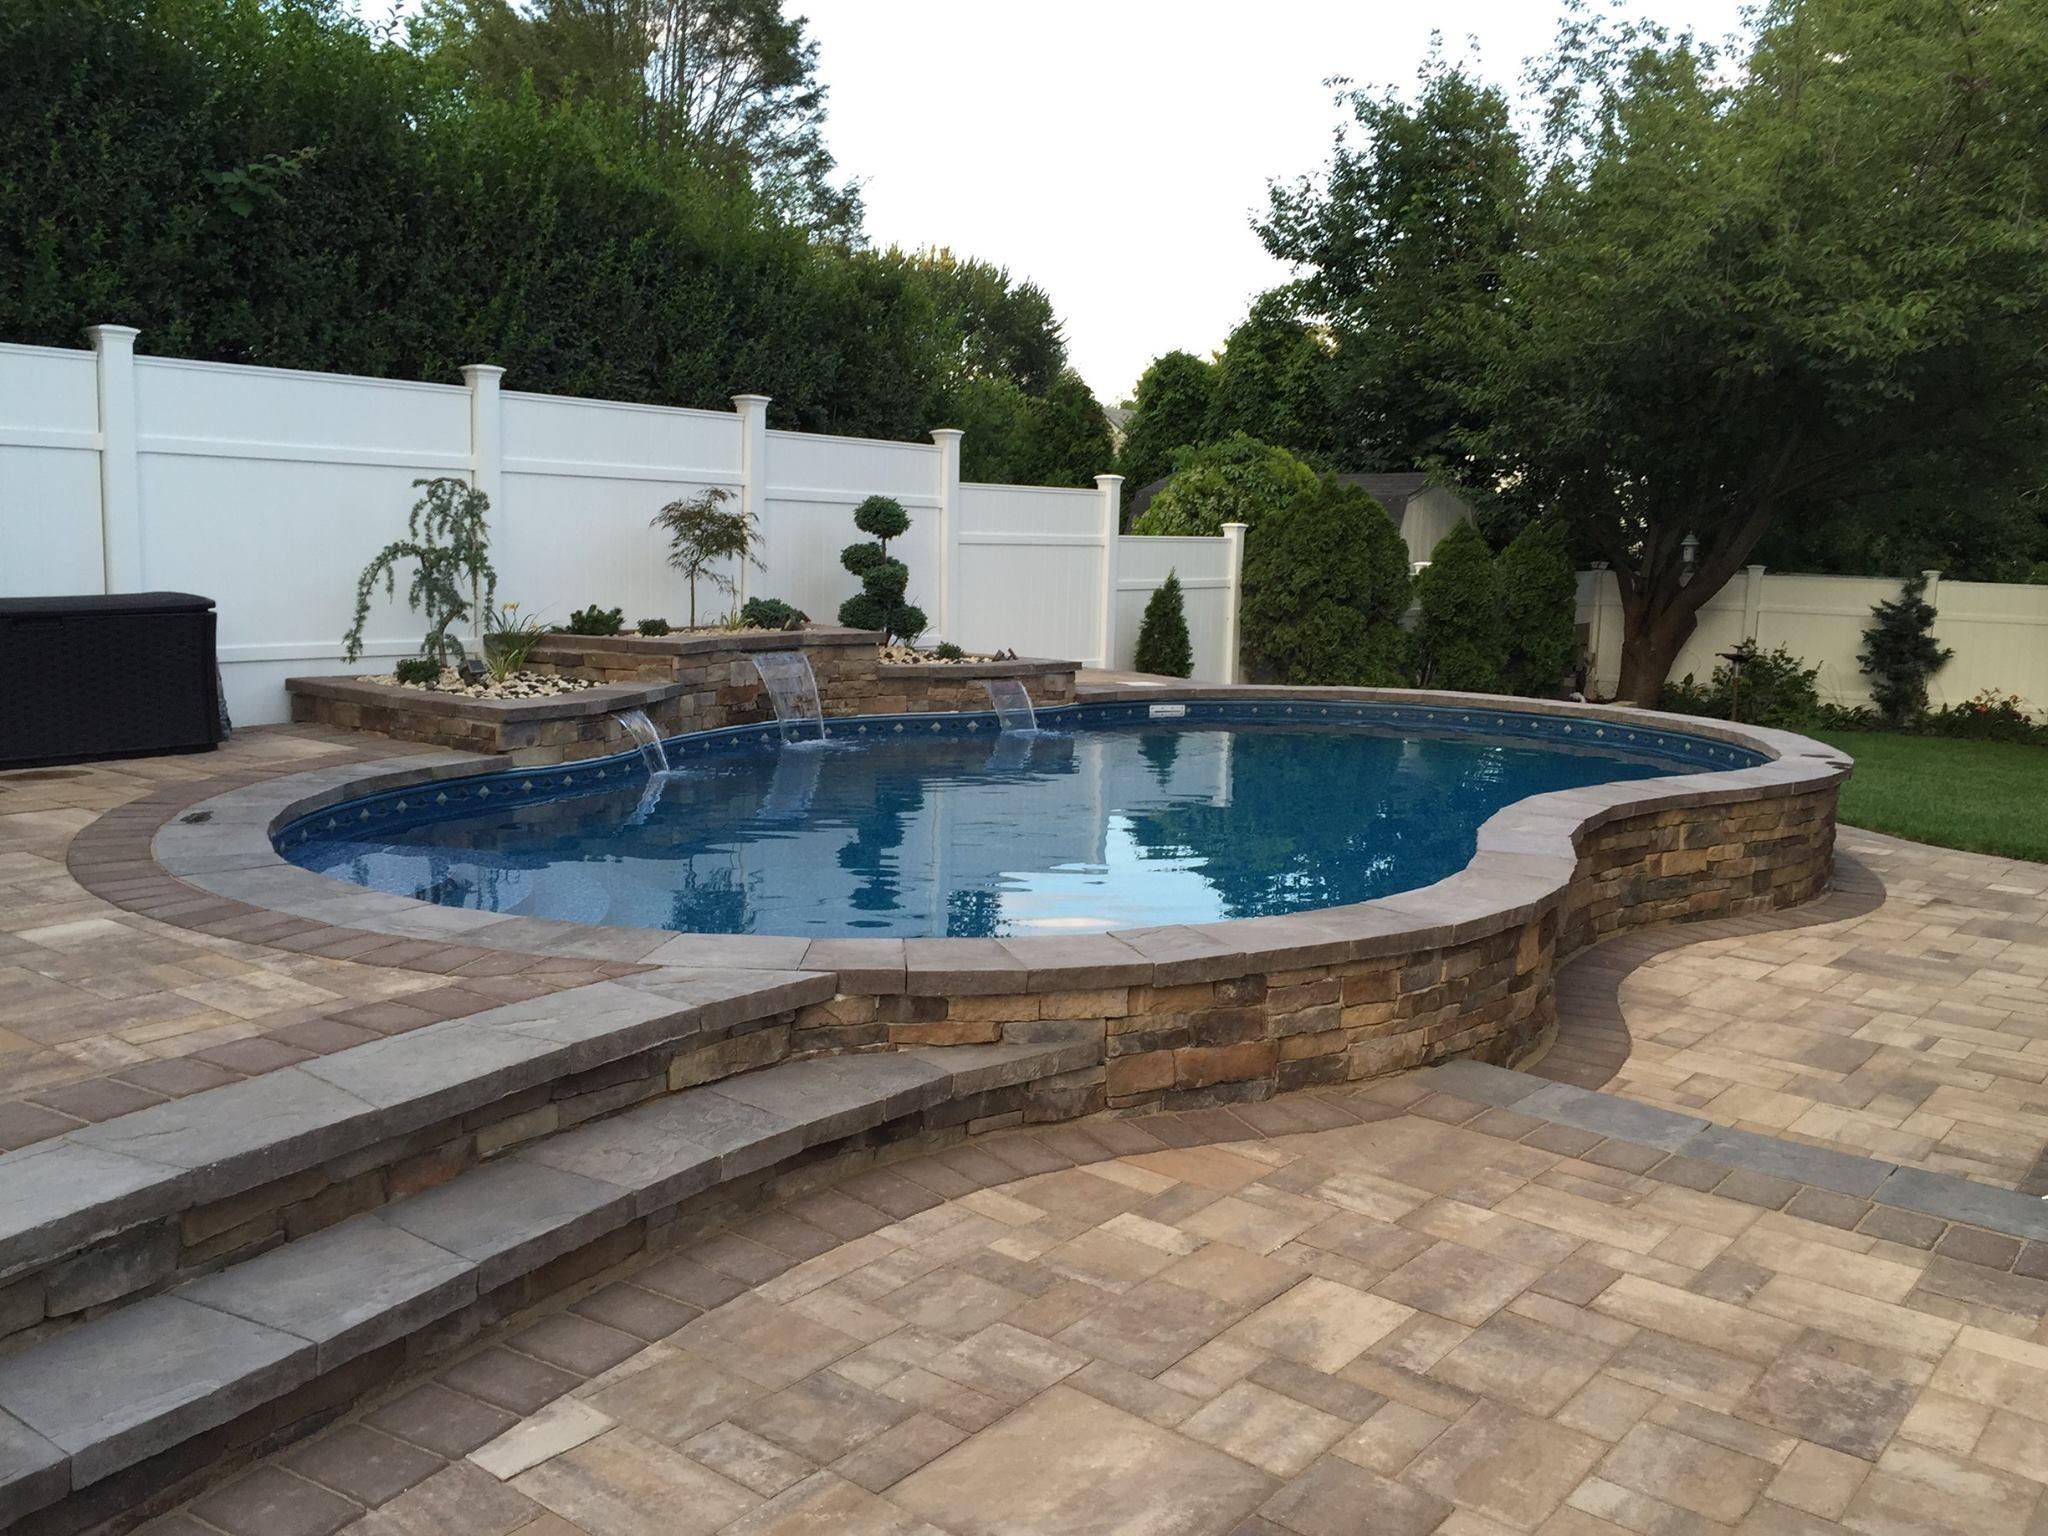 Beautiful 16 X 27 Radiant Freeform Pool With Inside Steps